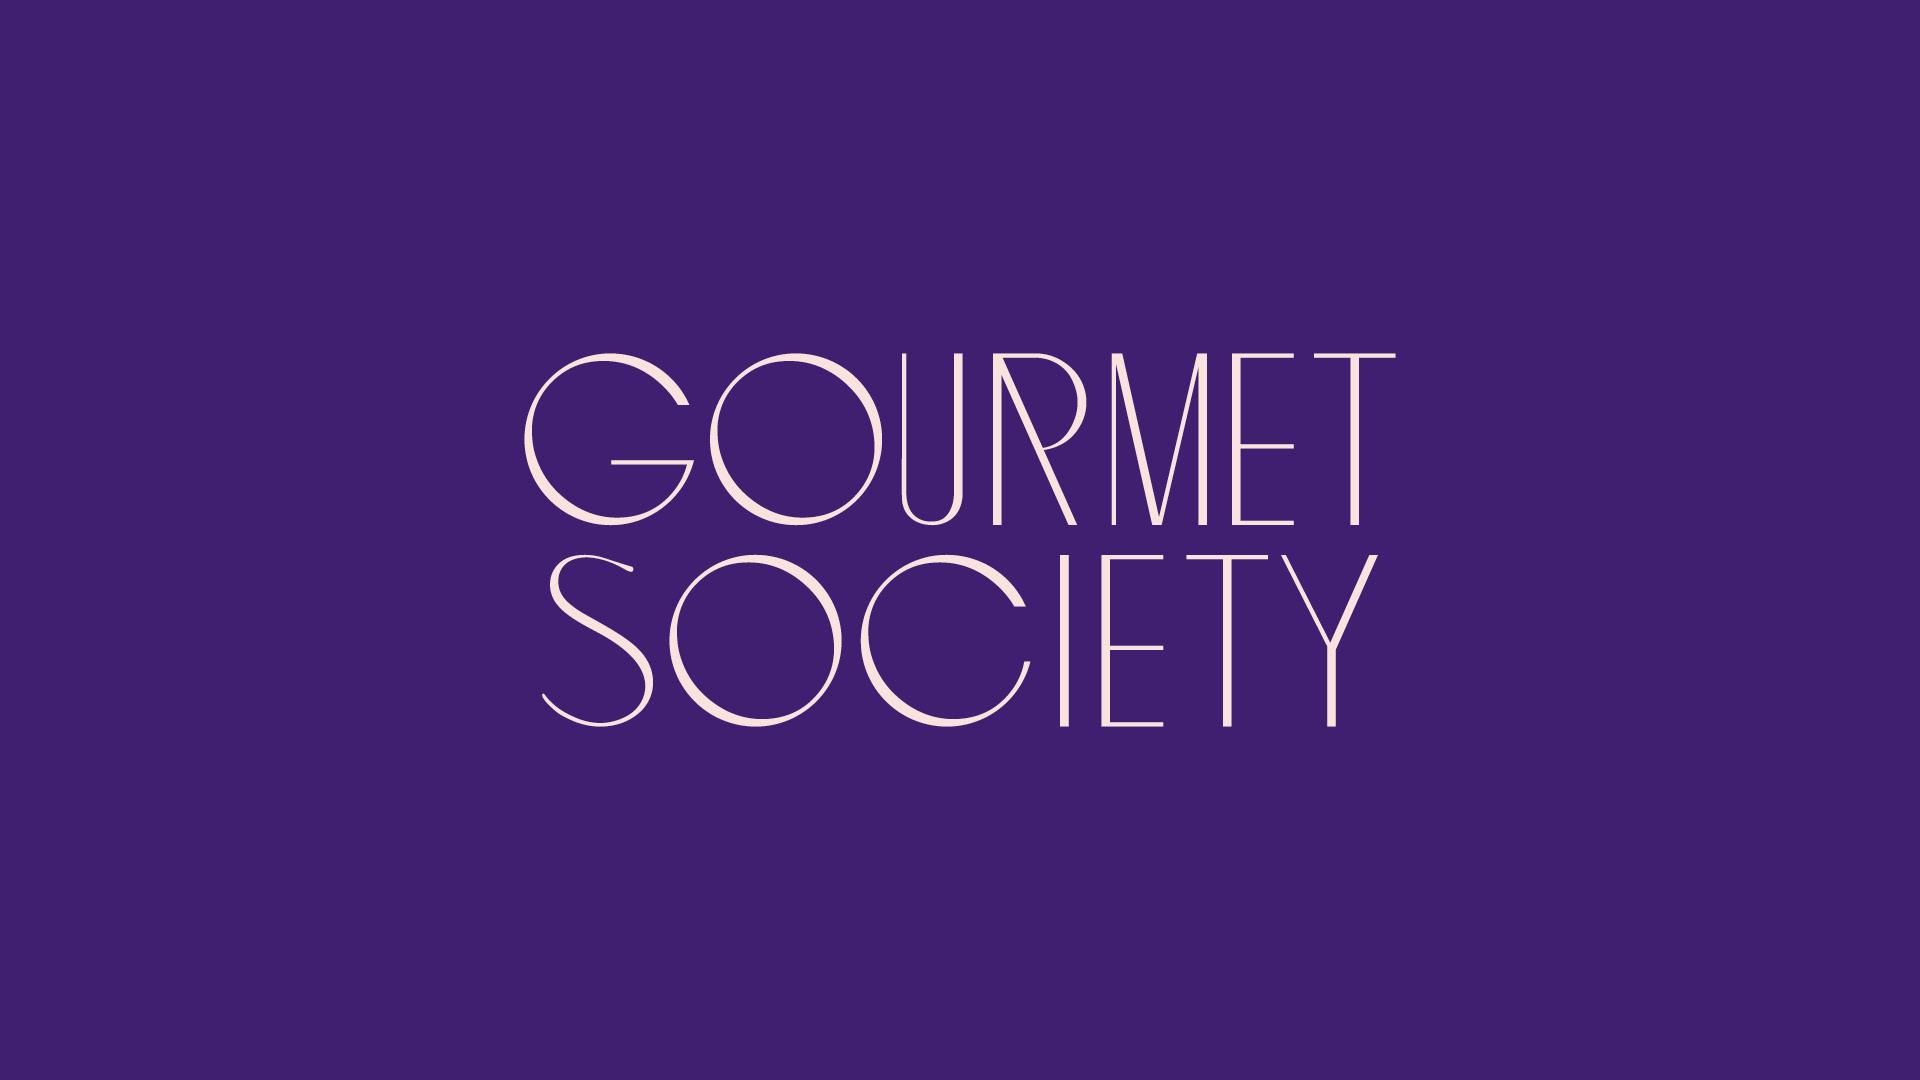 GourmetSociety-Work-By-YaStudio-09